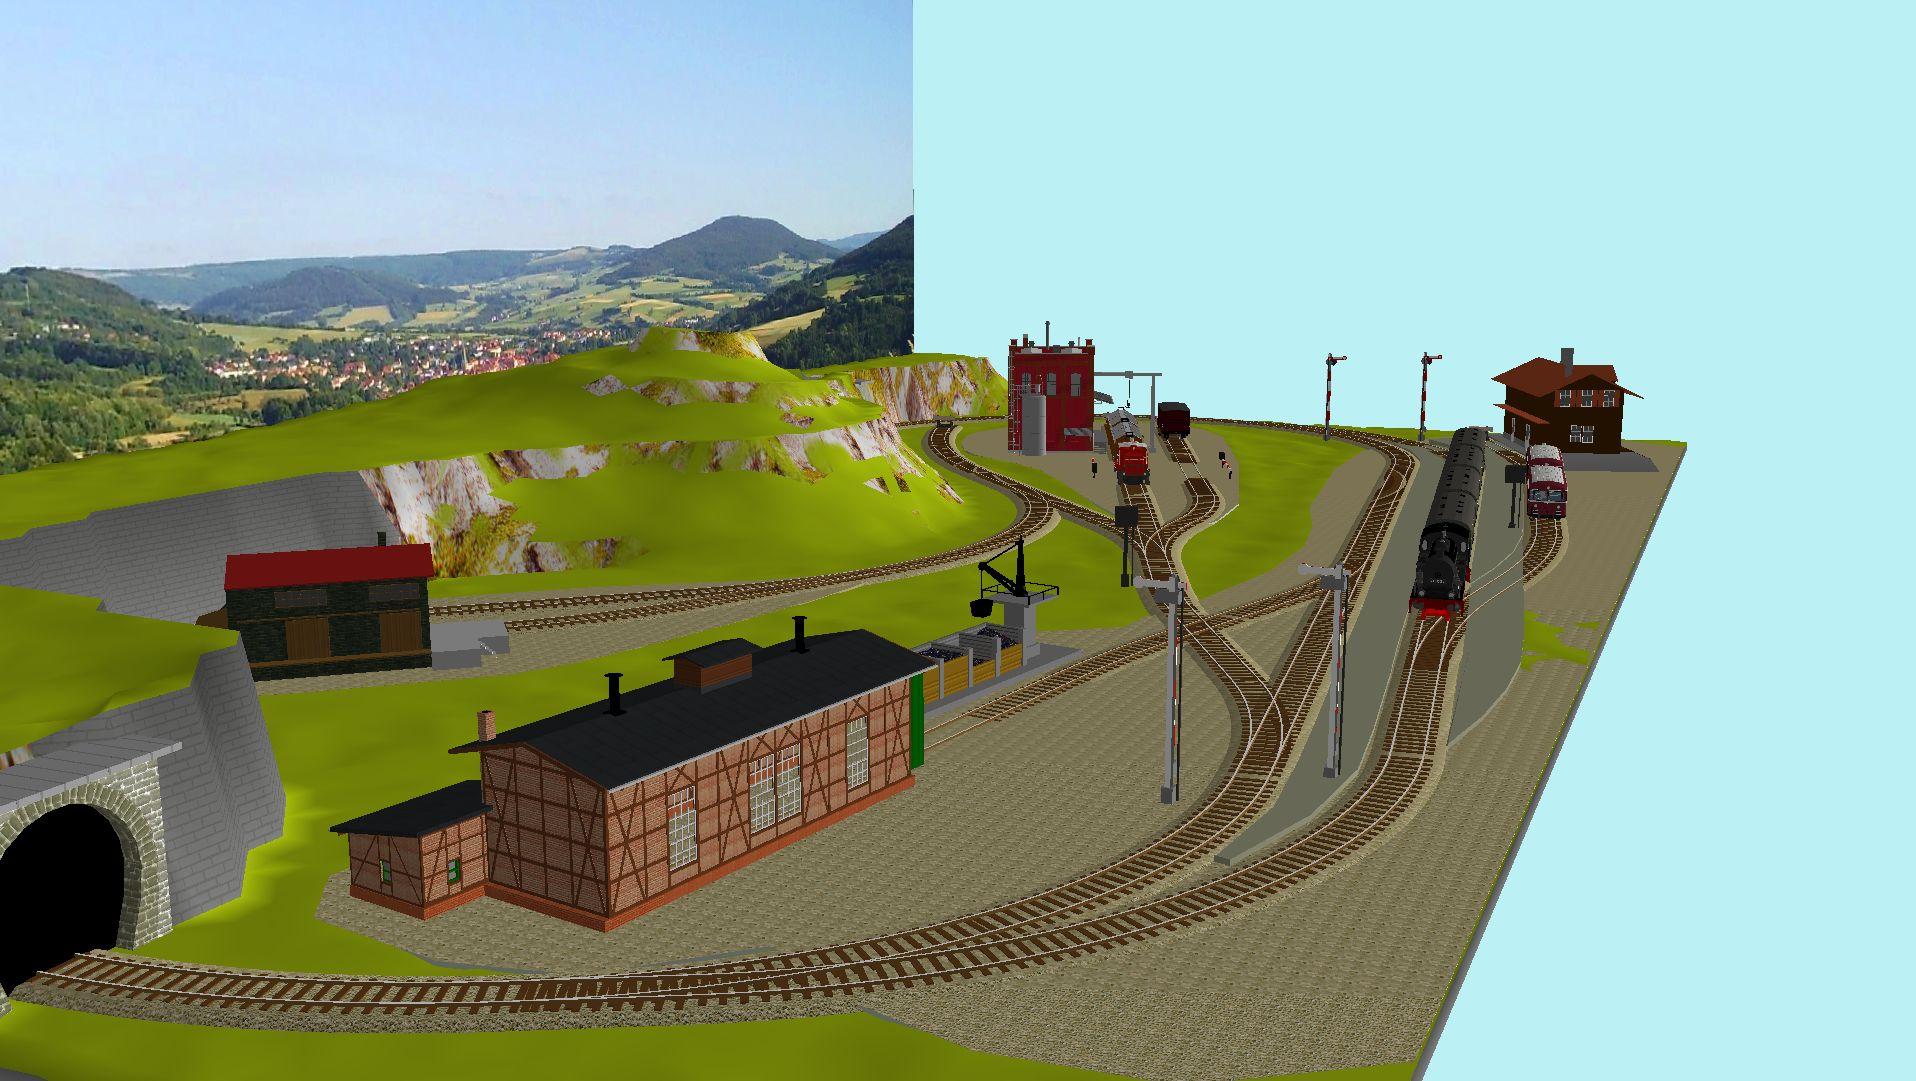 'ALBA Modellbahnpraxis' Band 1, Plan 5 Amp-1_5_k-gleis_1p3jhj